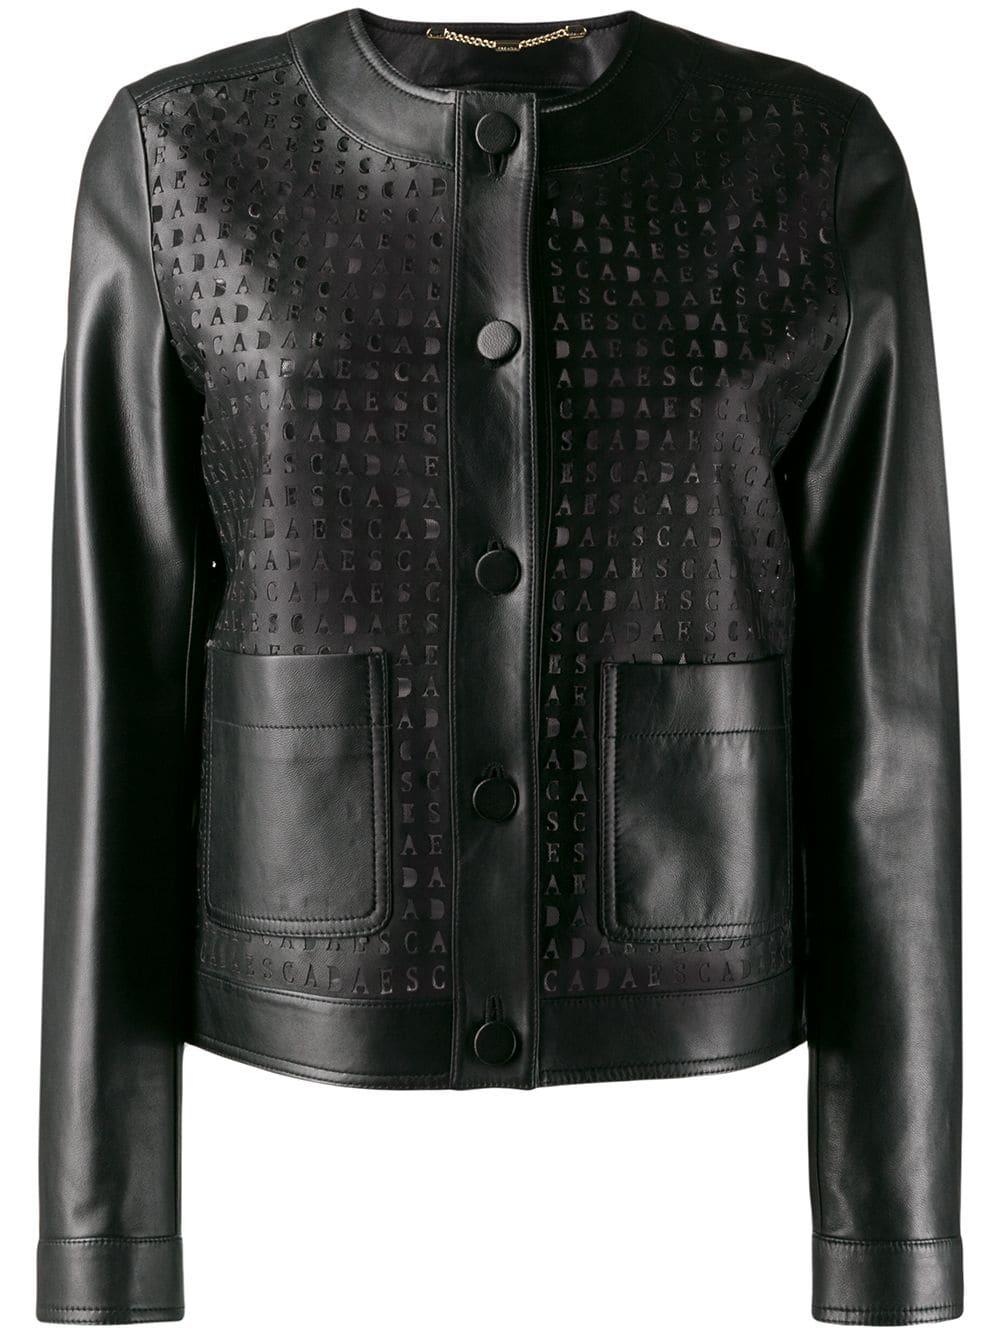 Escada Perforated Leather Jacket Farfetch [ 1334 x 1000 Pixel ]